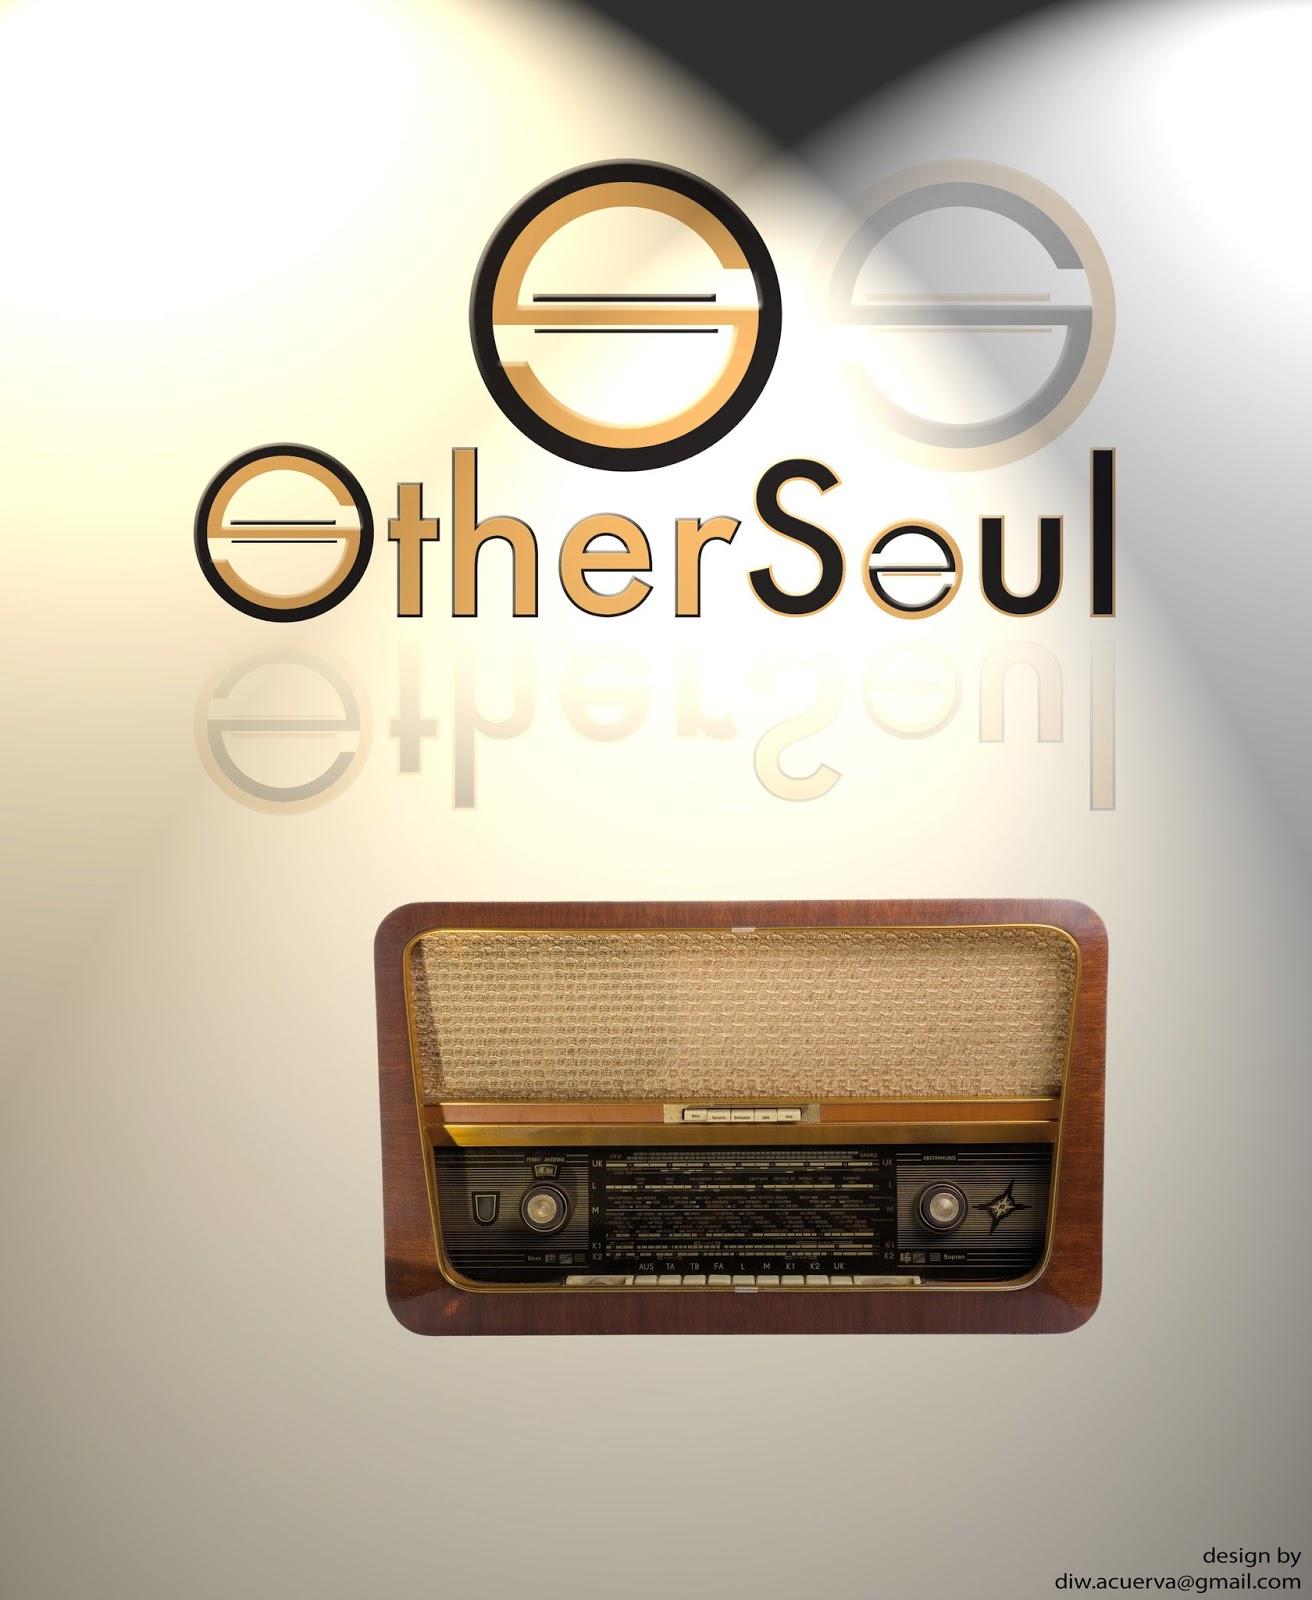 http://1.bp.blogspot.com/-hL_6QSzPBAA/UI4hLF_EozI/AAAAAAAAAb8/JpP5x1lZMLA/s1600/other+soul.jpg